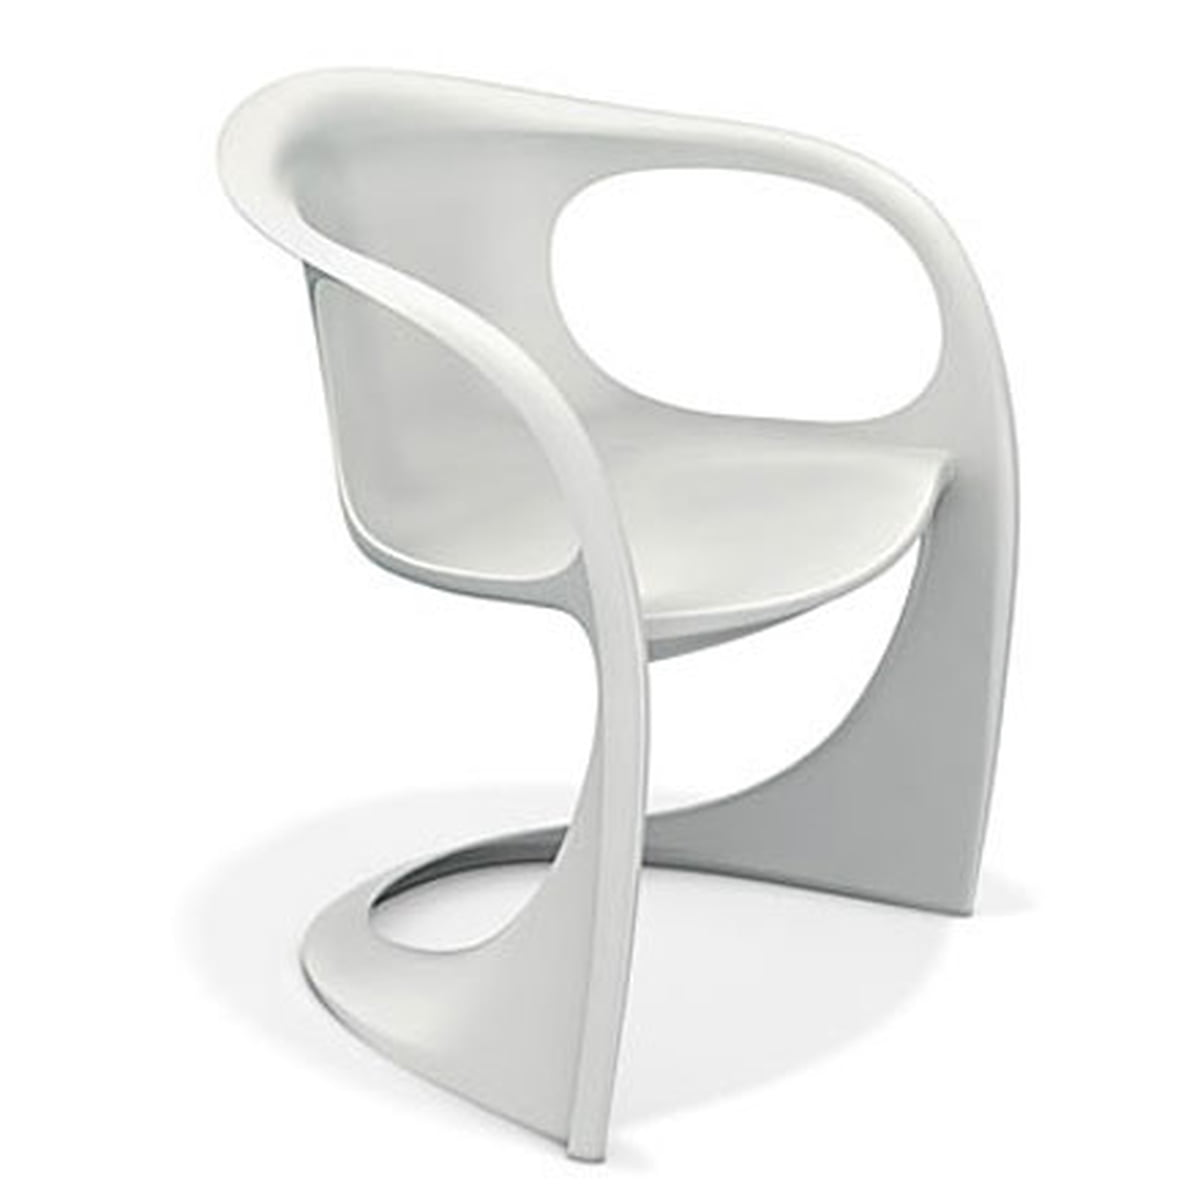 casalino 2007 10 armlehnstuhl casala shop. Black Bedroom Furniture Sets. Home Design Ideas